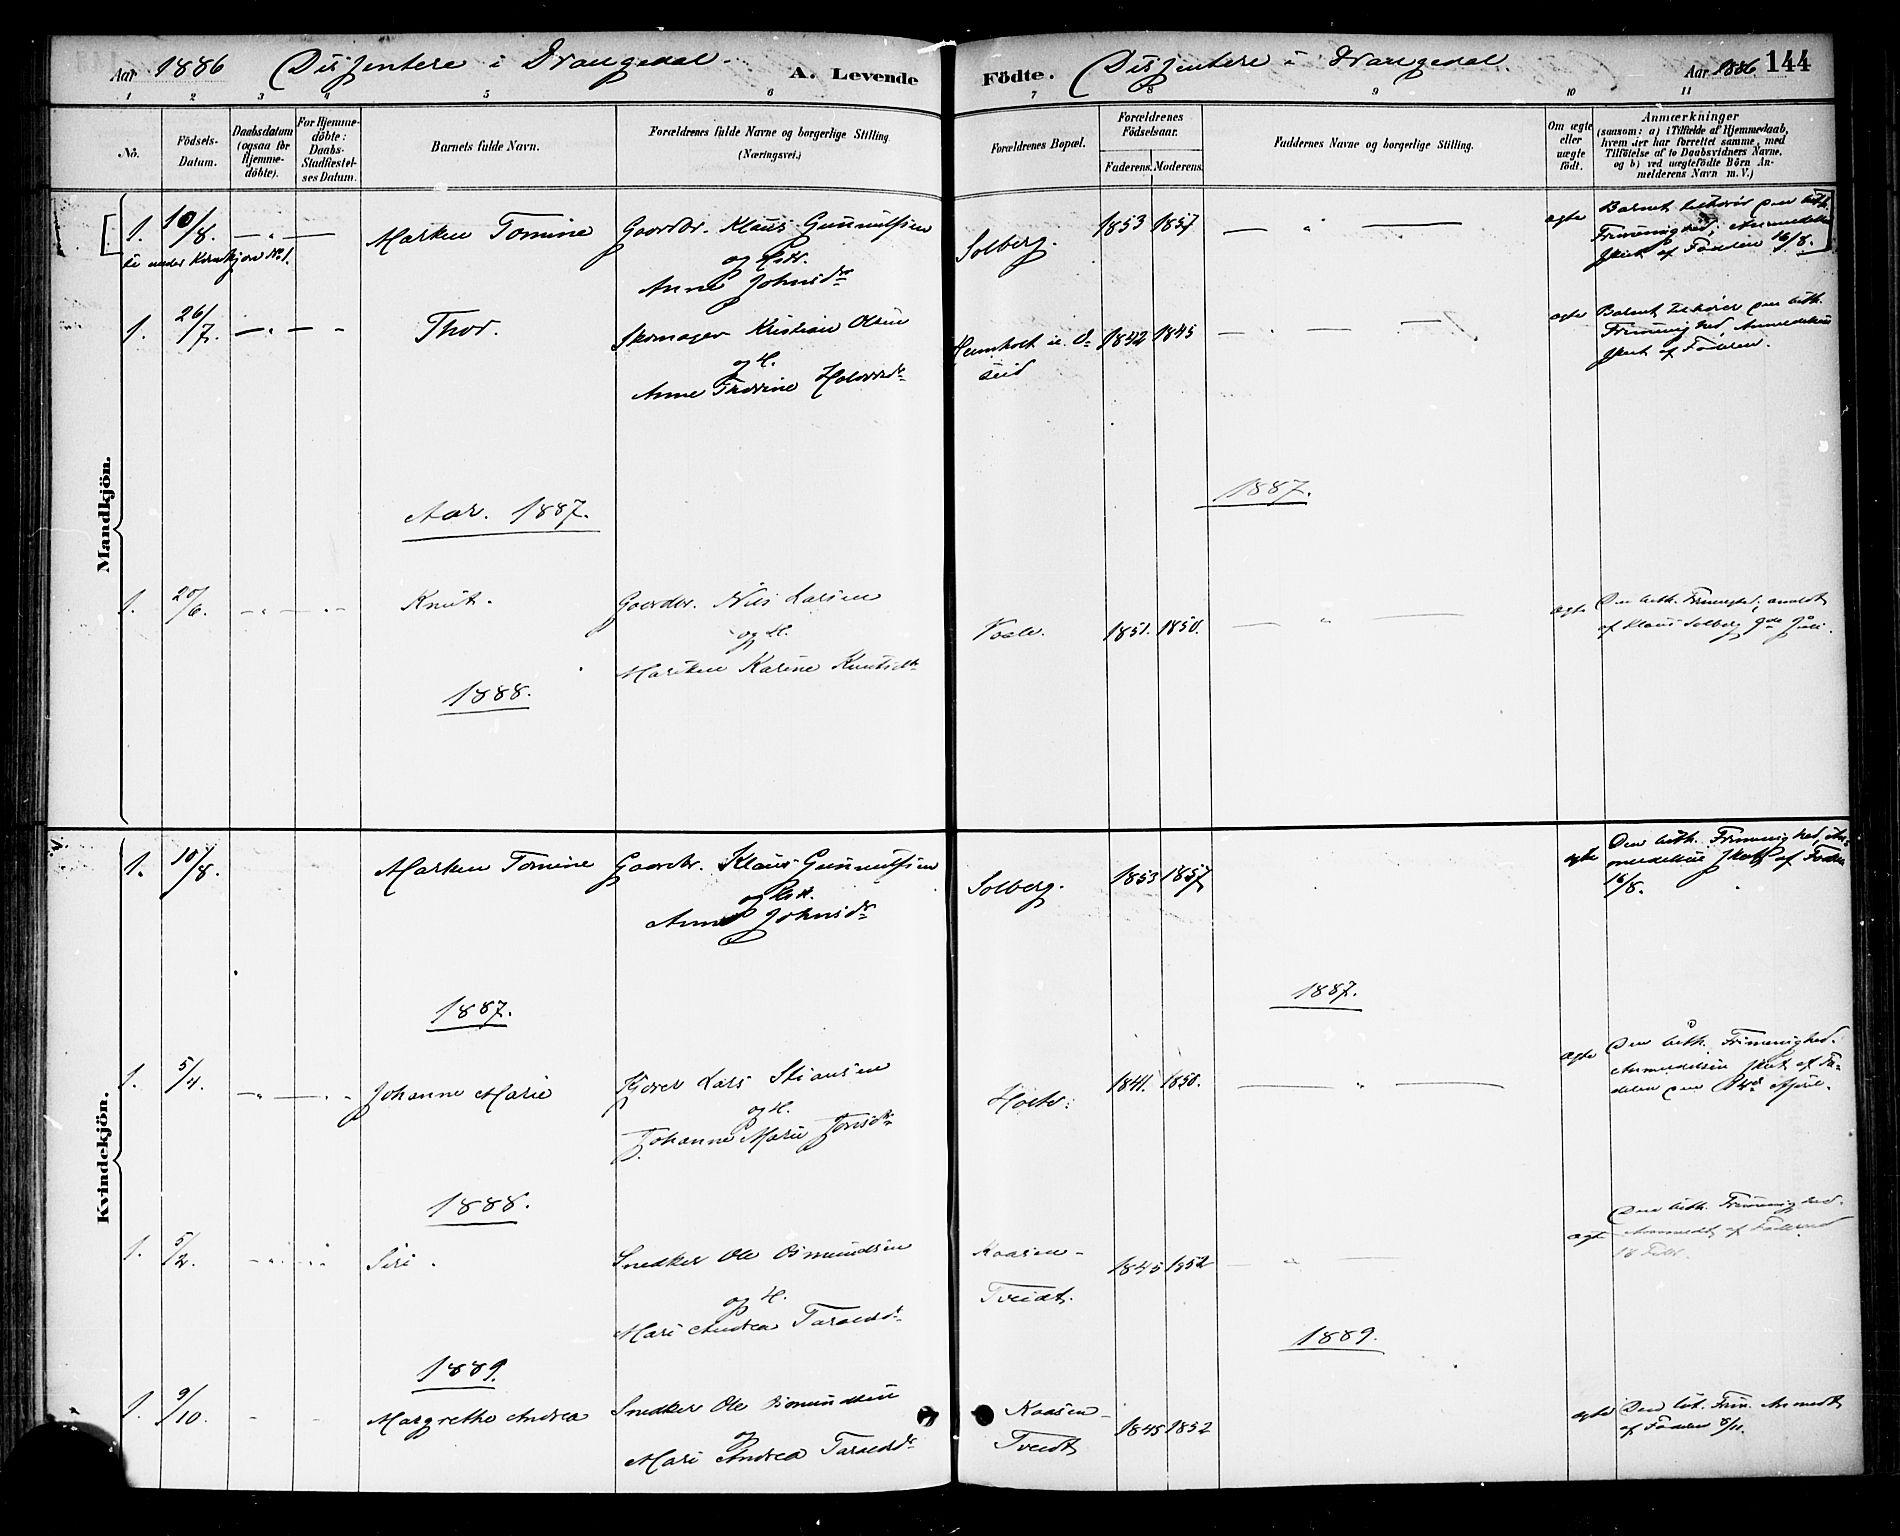 SAKO, Drangedal kirkebøker, F/Fa/L0010: Ministerialbok nr. 10 /1, 1885-1894, s. 144